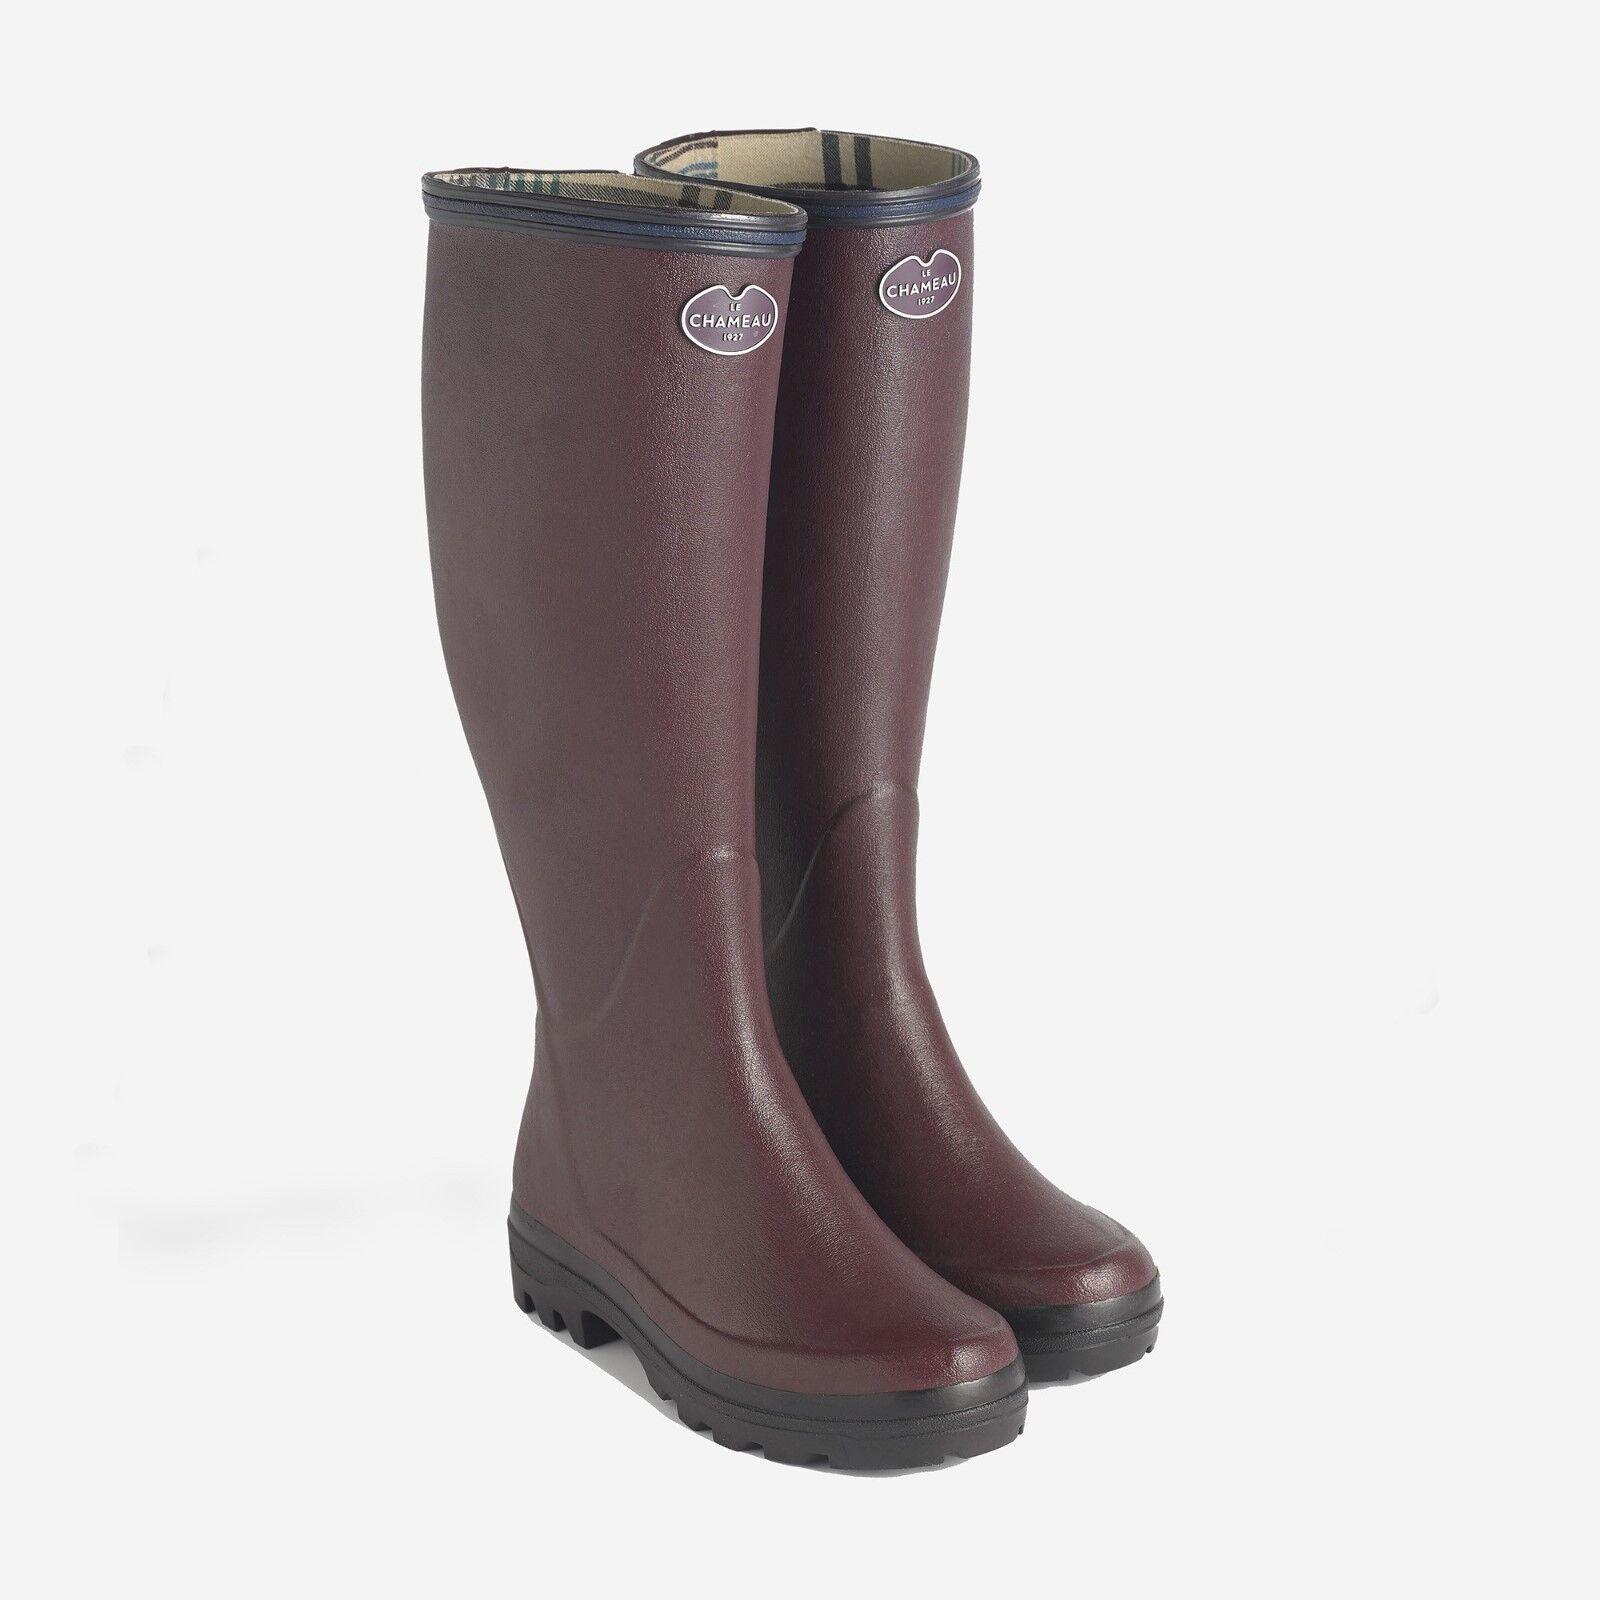 Le Chameau Giverny Cereza algodón señoras Forrado Wellingtons botas GRATIS UK FRANQUEO